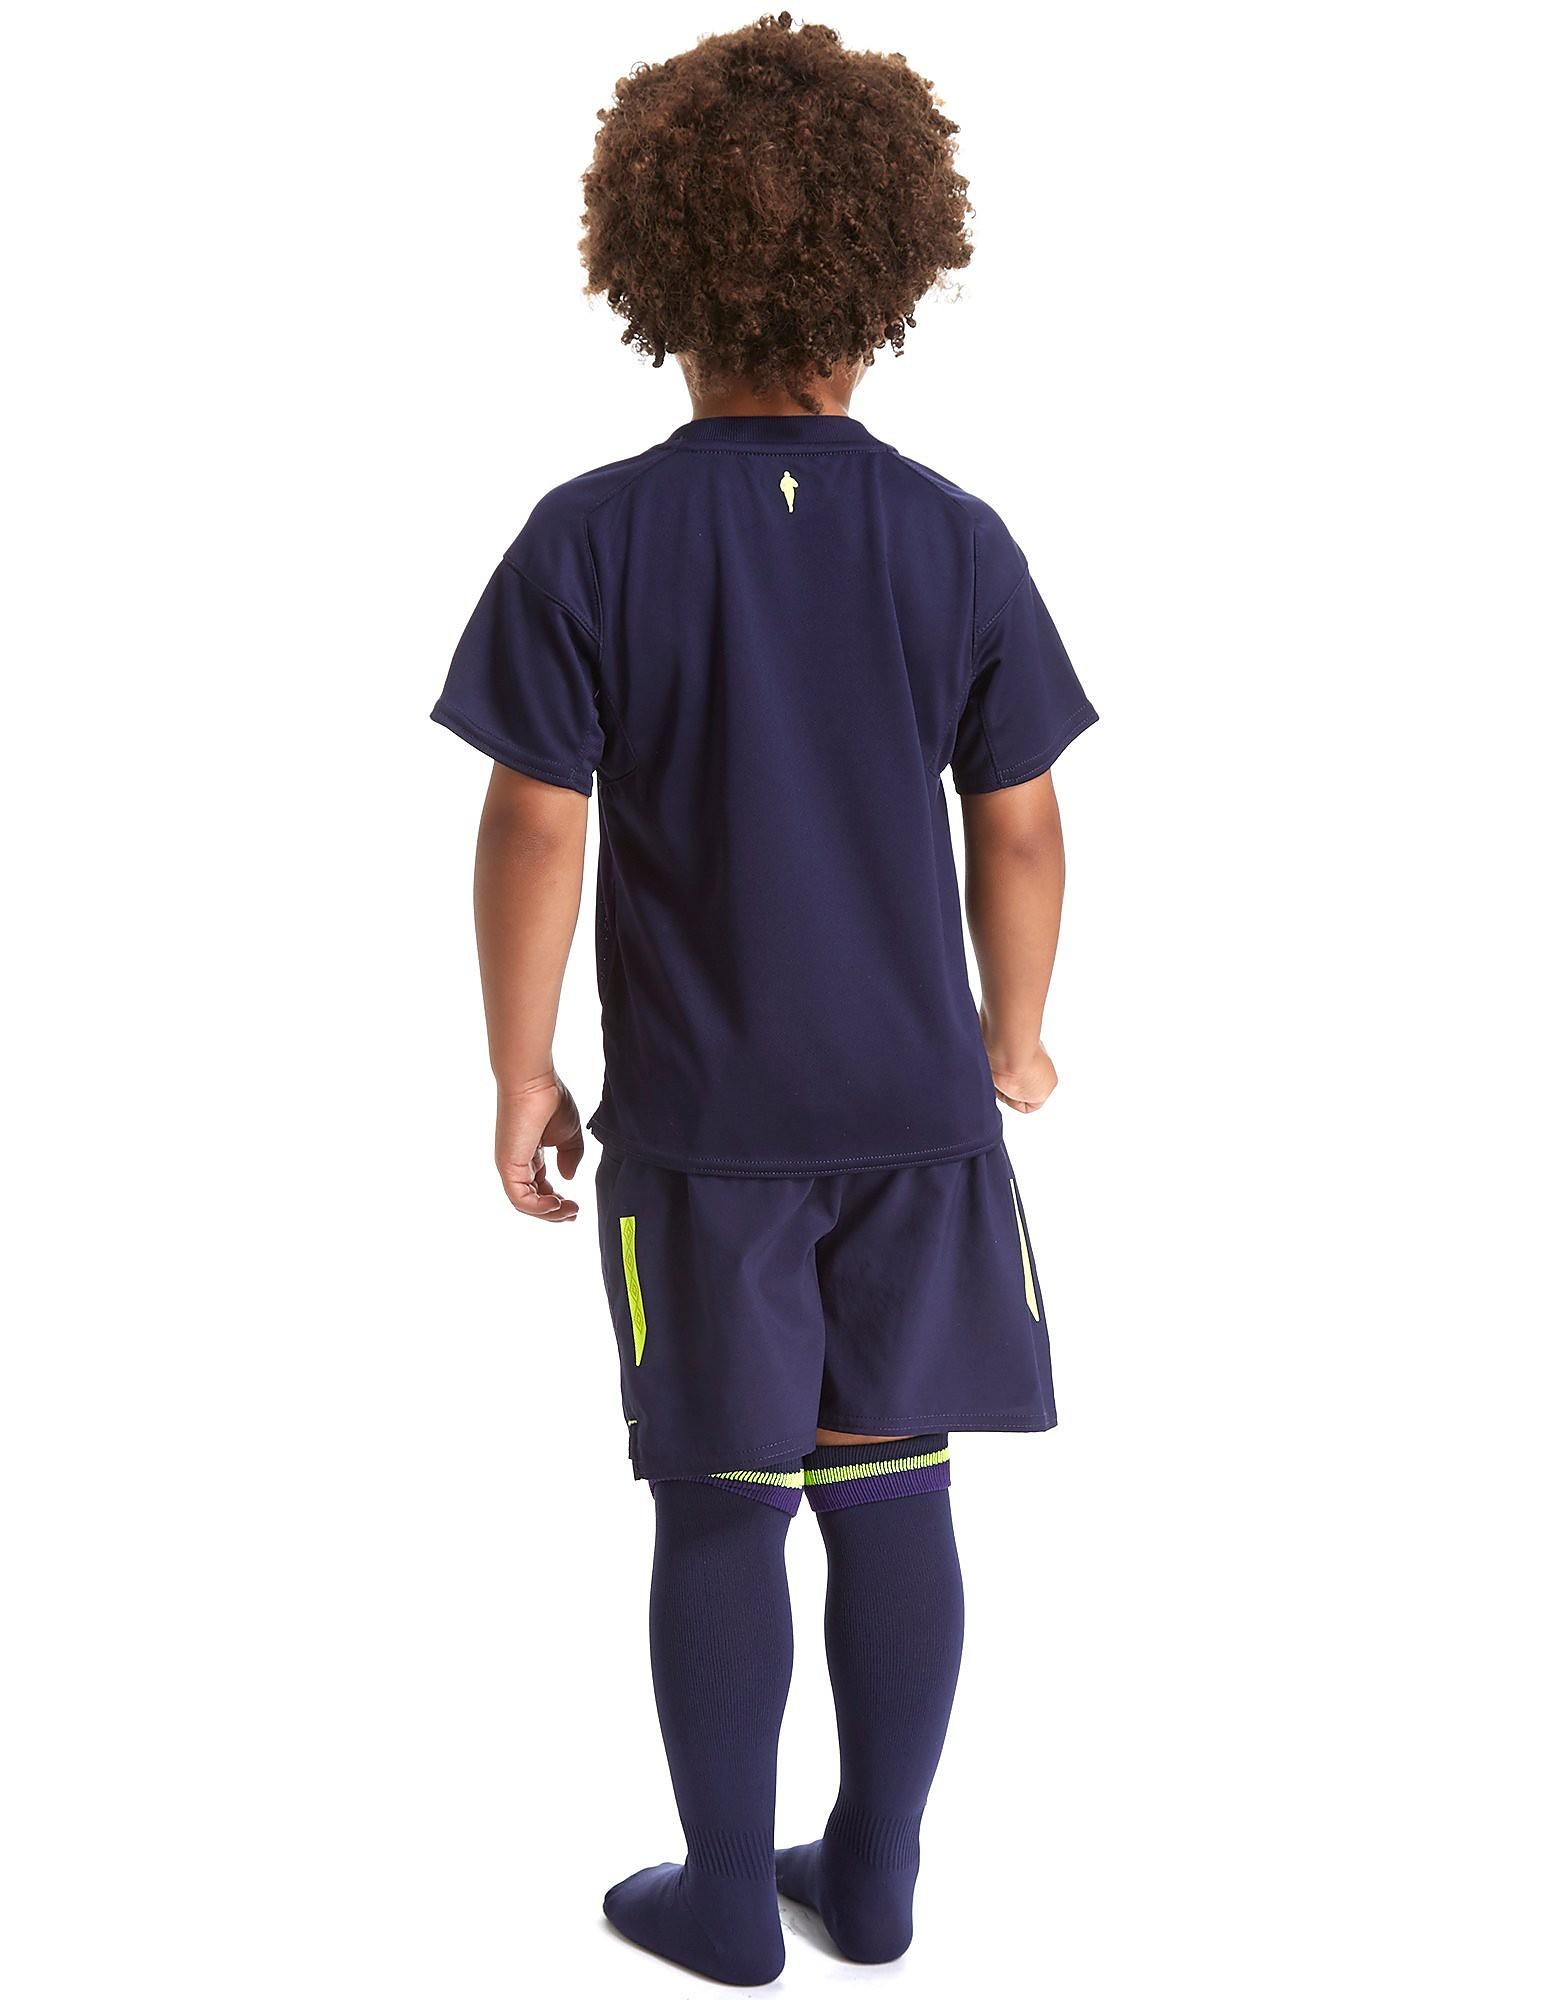 Umbro Everton FC 2017/18 Third Kit Children